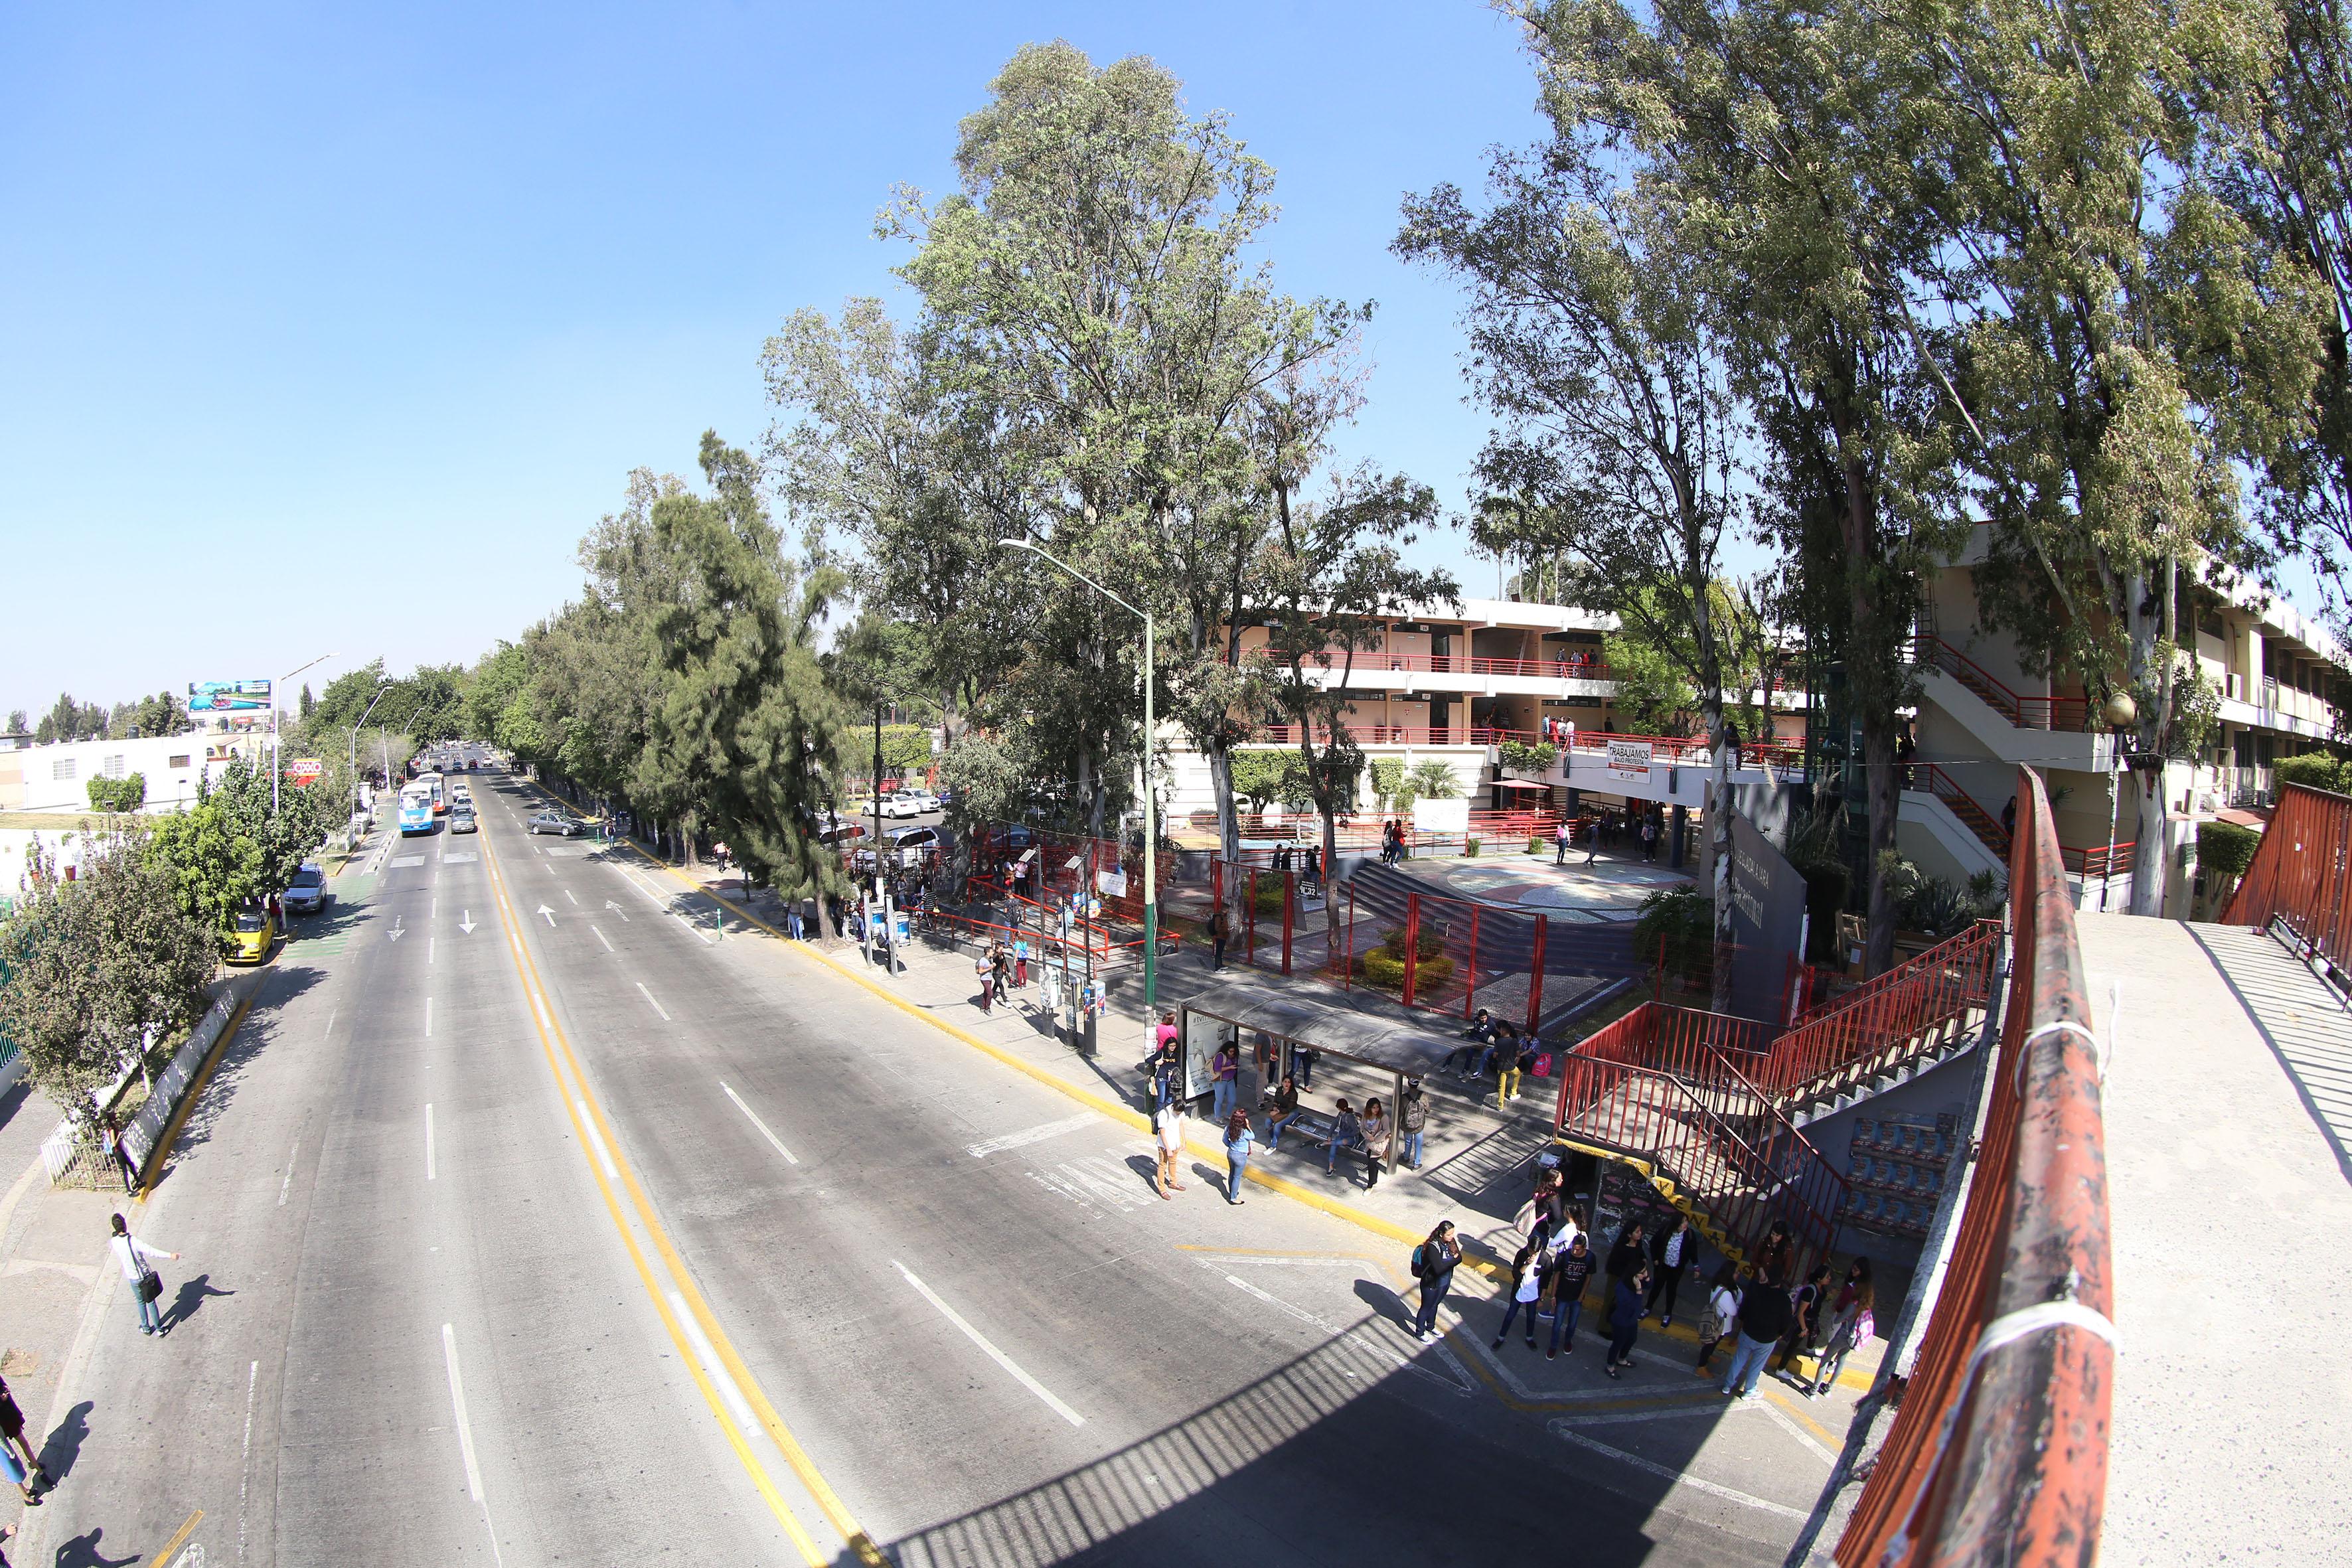 Vista aérea de la escuela Preparatoria Vocaional de Guadalajara